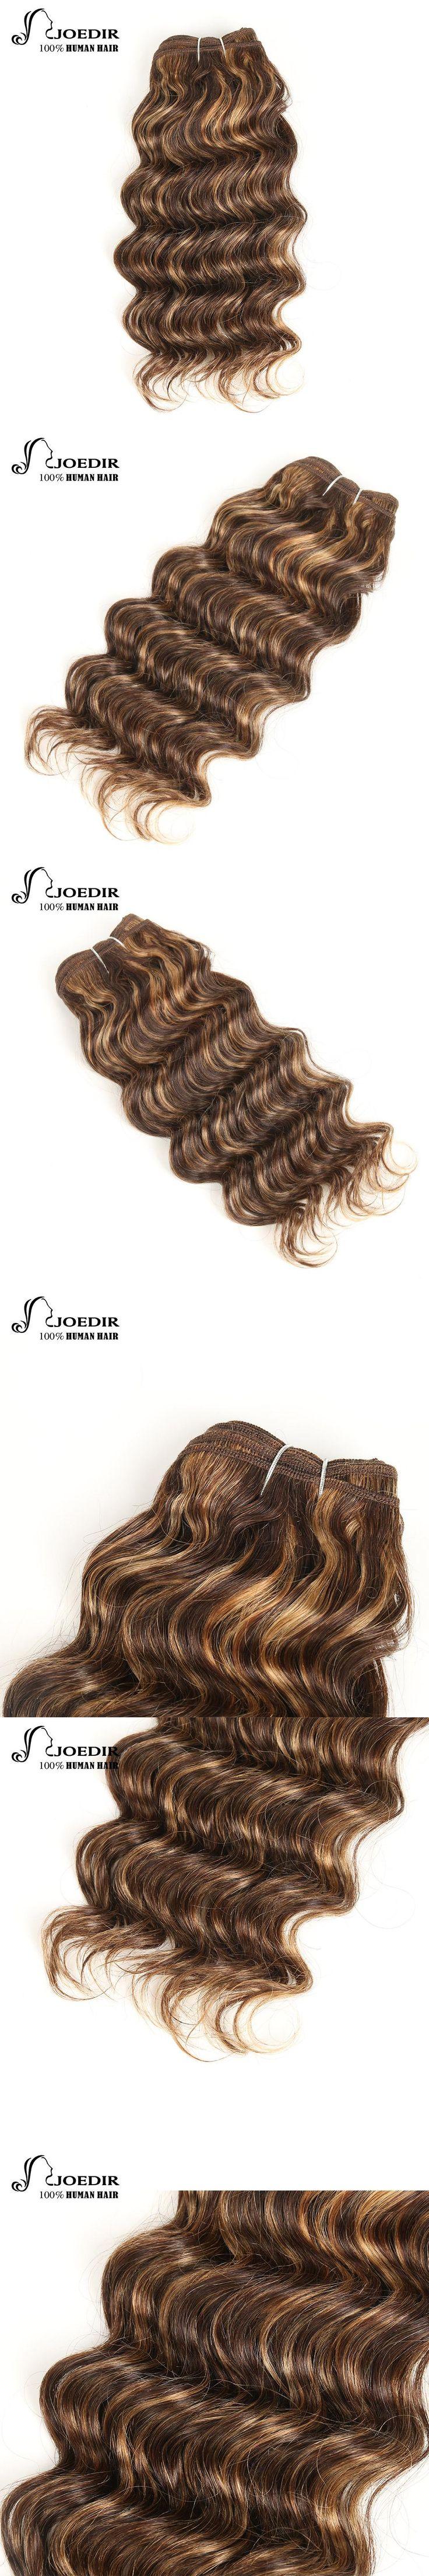 Joedir Pre-Colored Brazilian Deep Wave Hair 100% Human Hair Bundles Remy Hair Weave Blonde Color 27 P4/27 Free Shipping